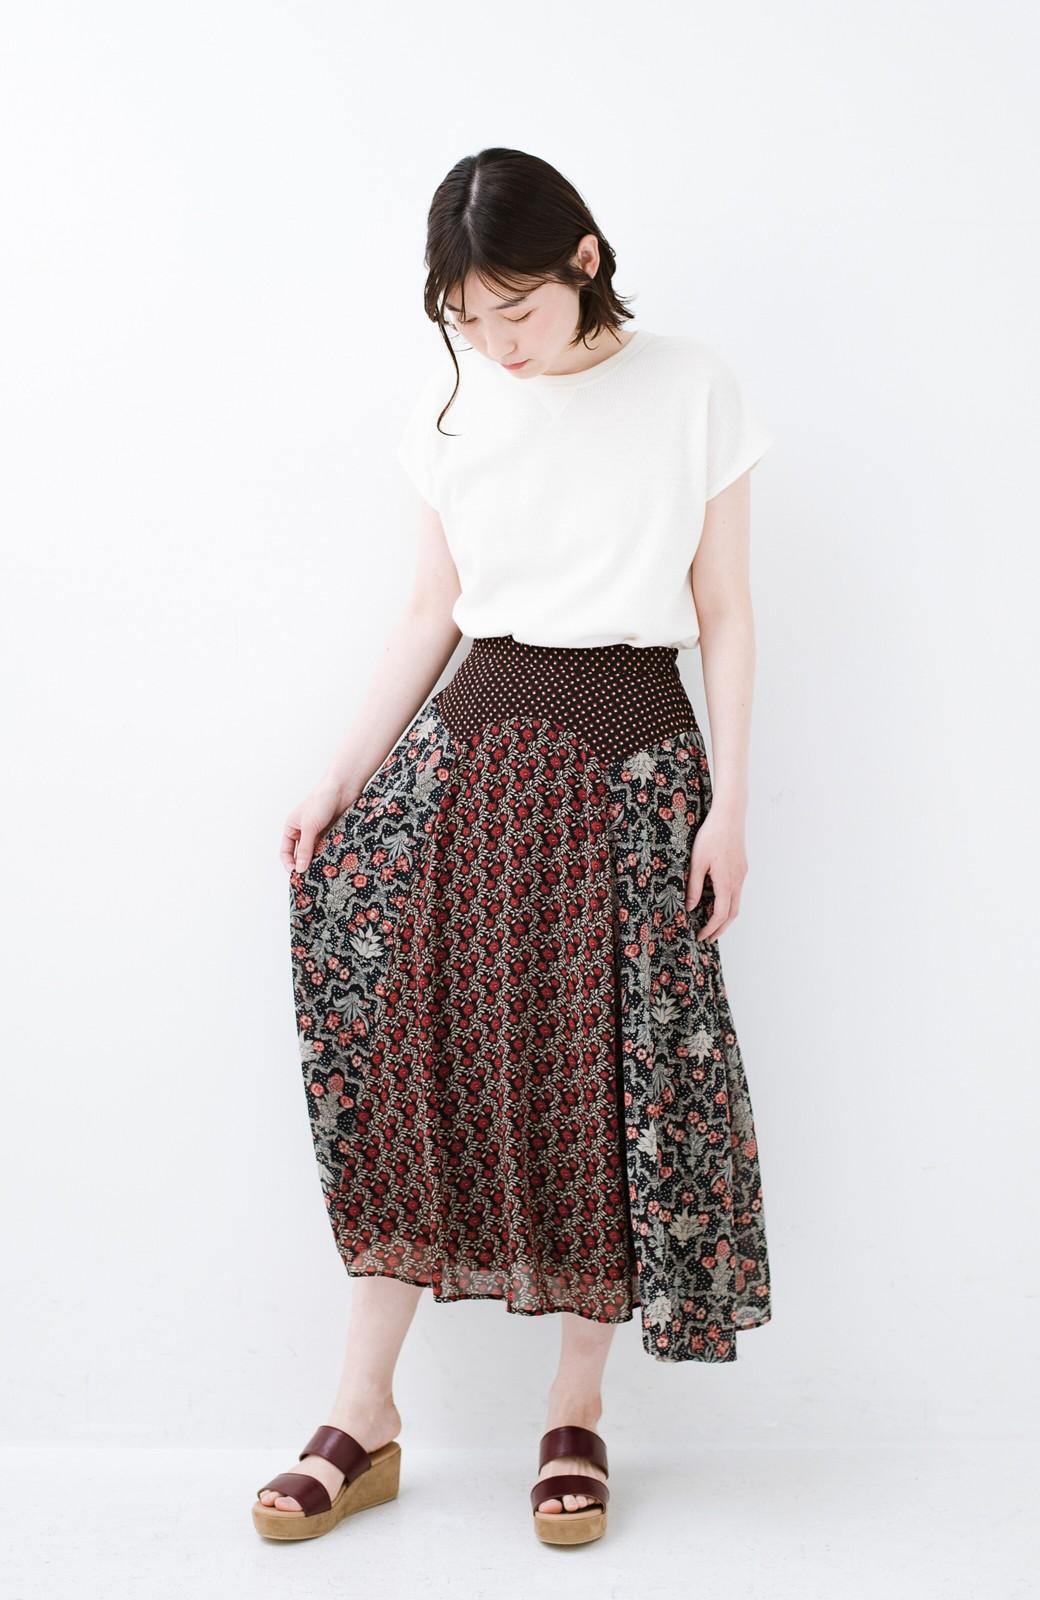 haco! 【洗濯機洗いOK】シンプルなトップスに合わせるだけでかわいくなれる MIX柄スカート <ブラック系その他>の商品写真12